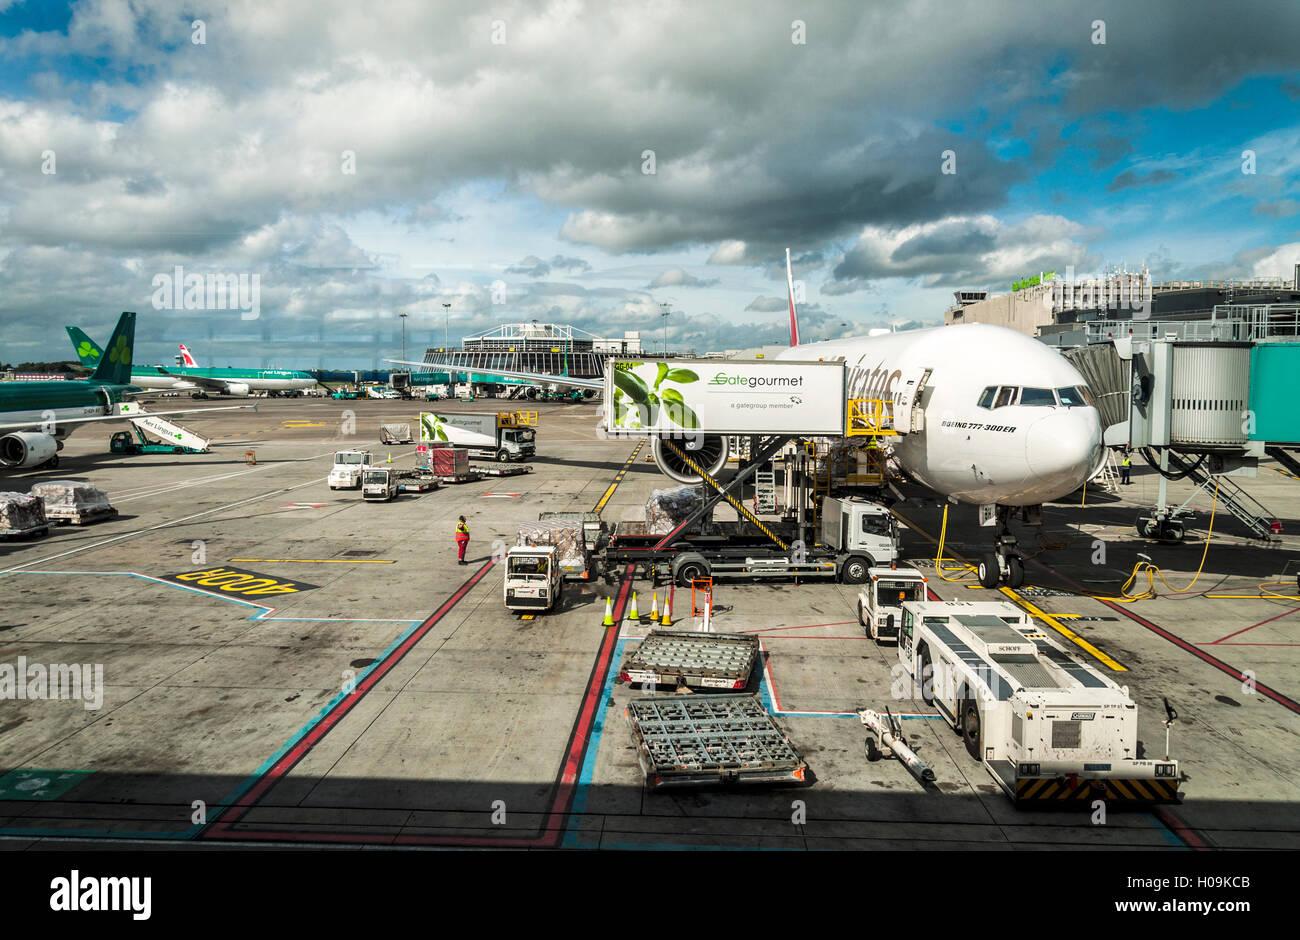 Aircraft Catering Stock Photos & Aircraft Catering Stock Images - Alamy